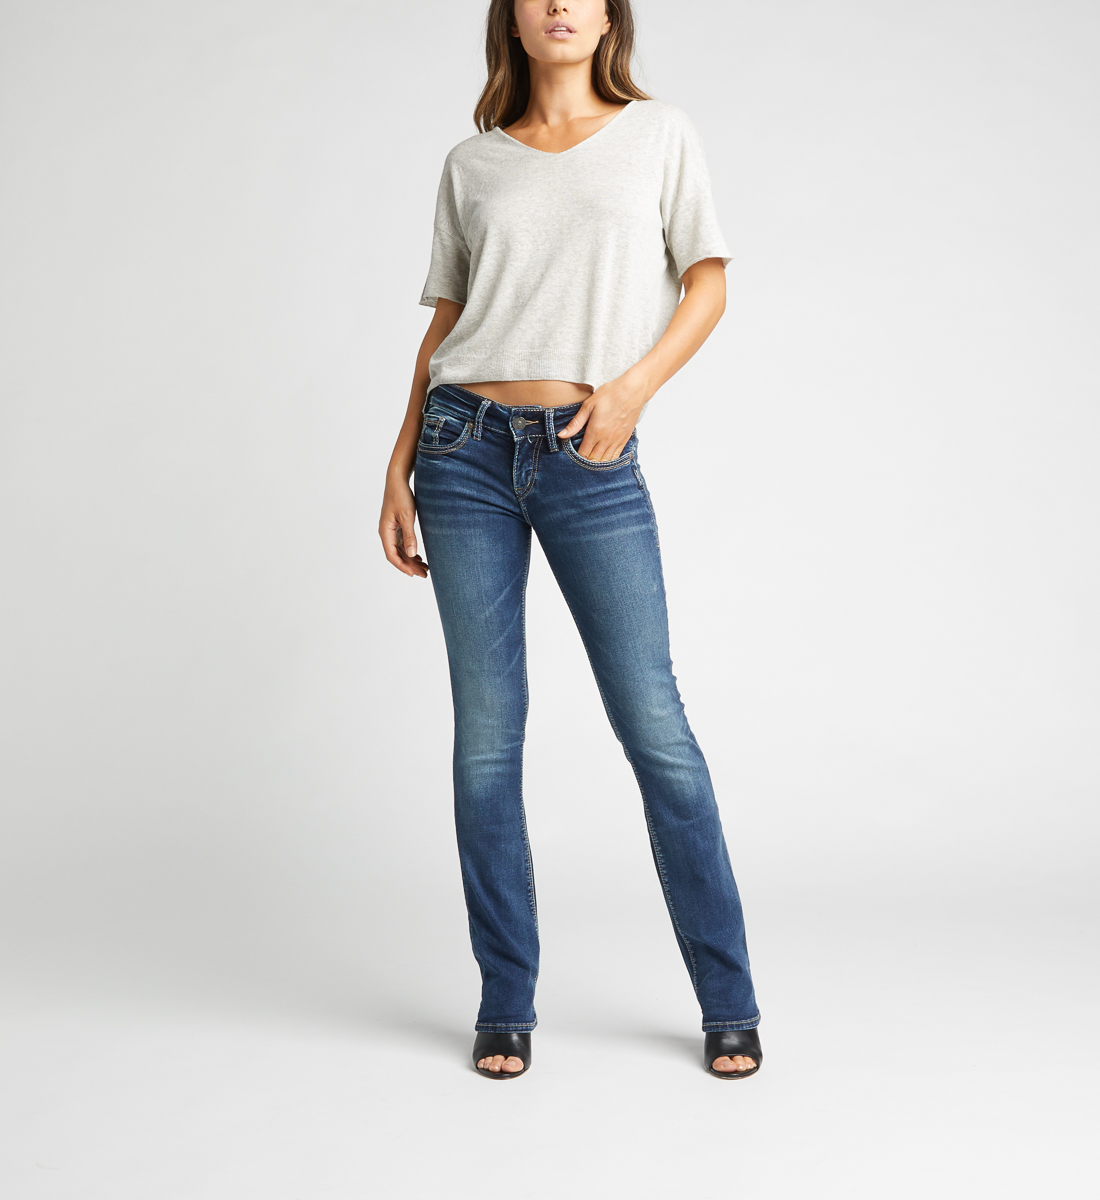 Silver Jeans Suki Slim Boot Rinse Wash